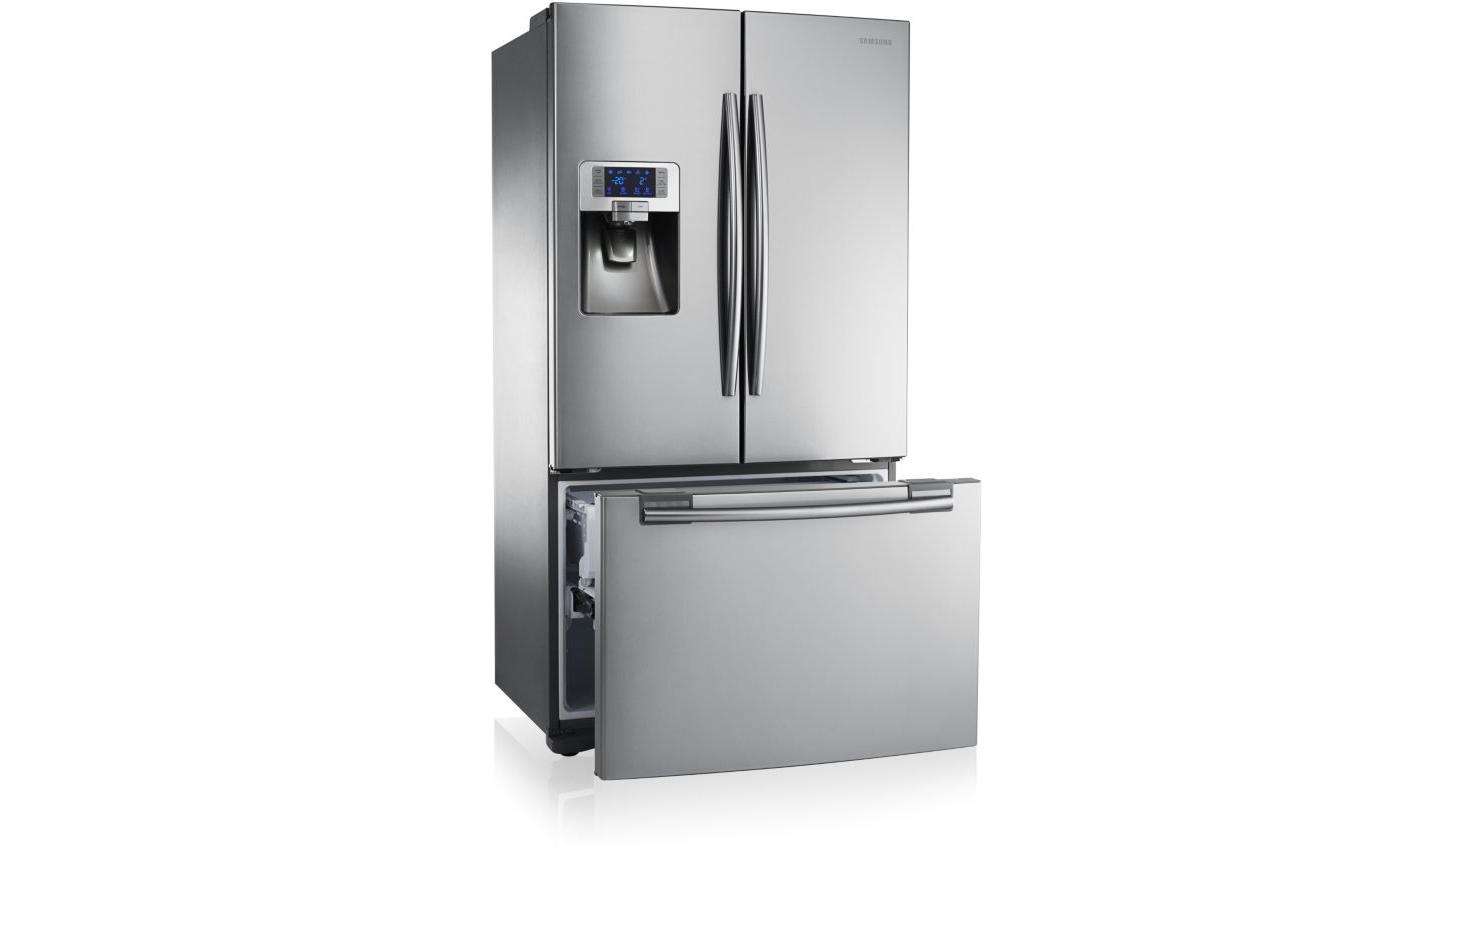 Samsung RFG23RESL Libera installazione 520L A+ Acciaio inossidabile frigorifero side-by-side